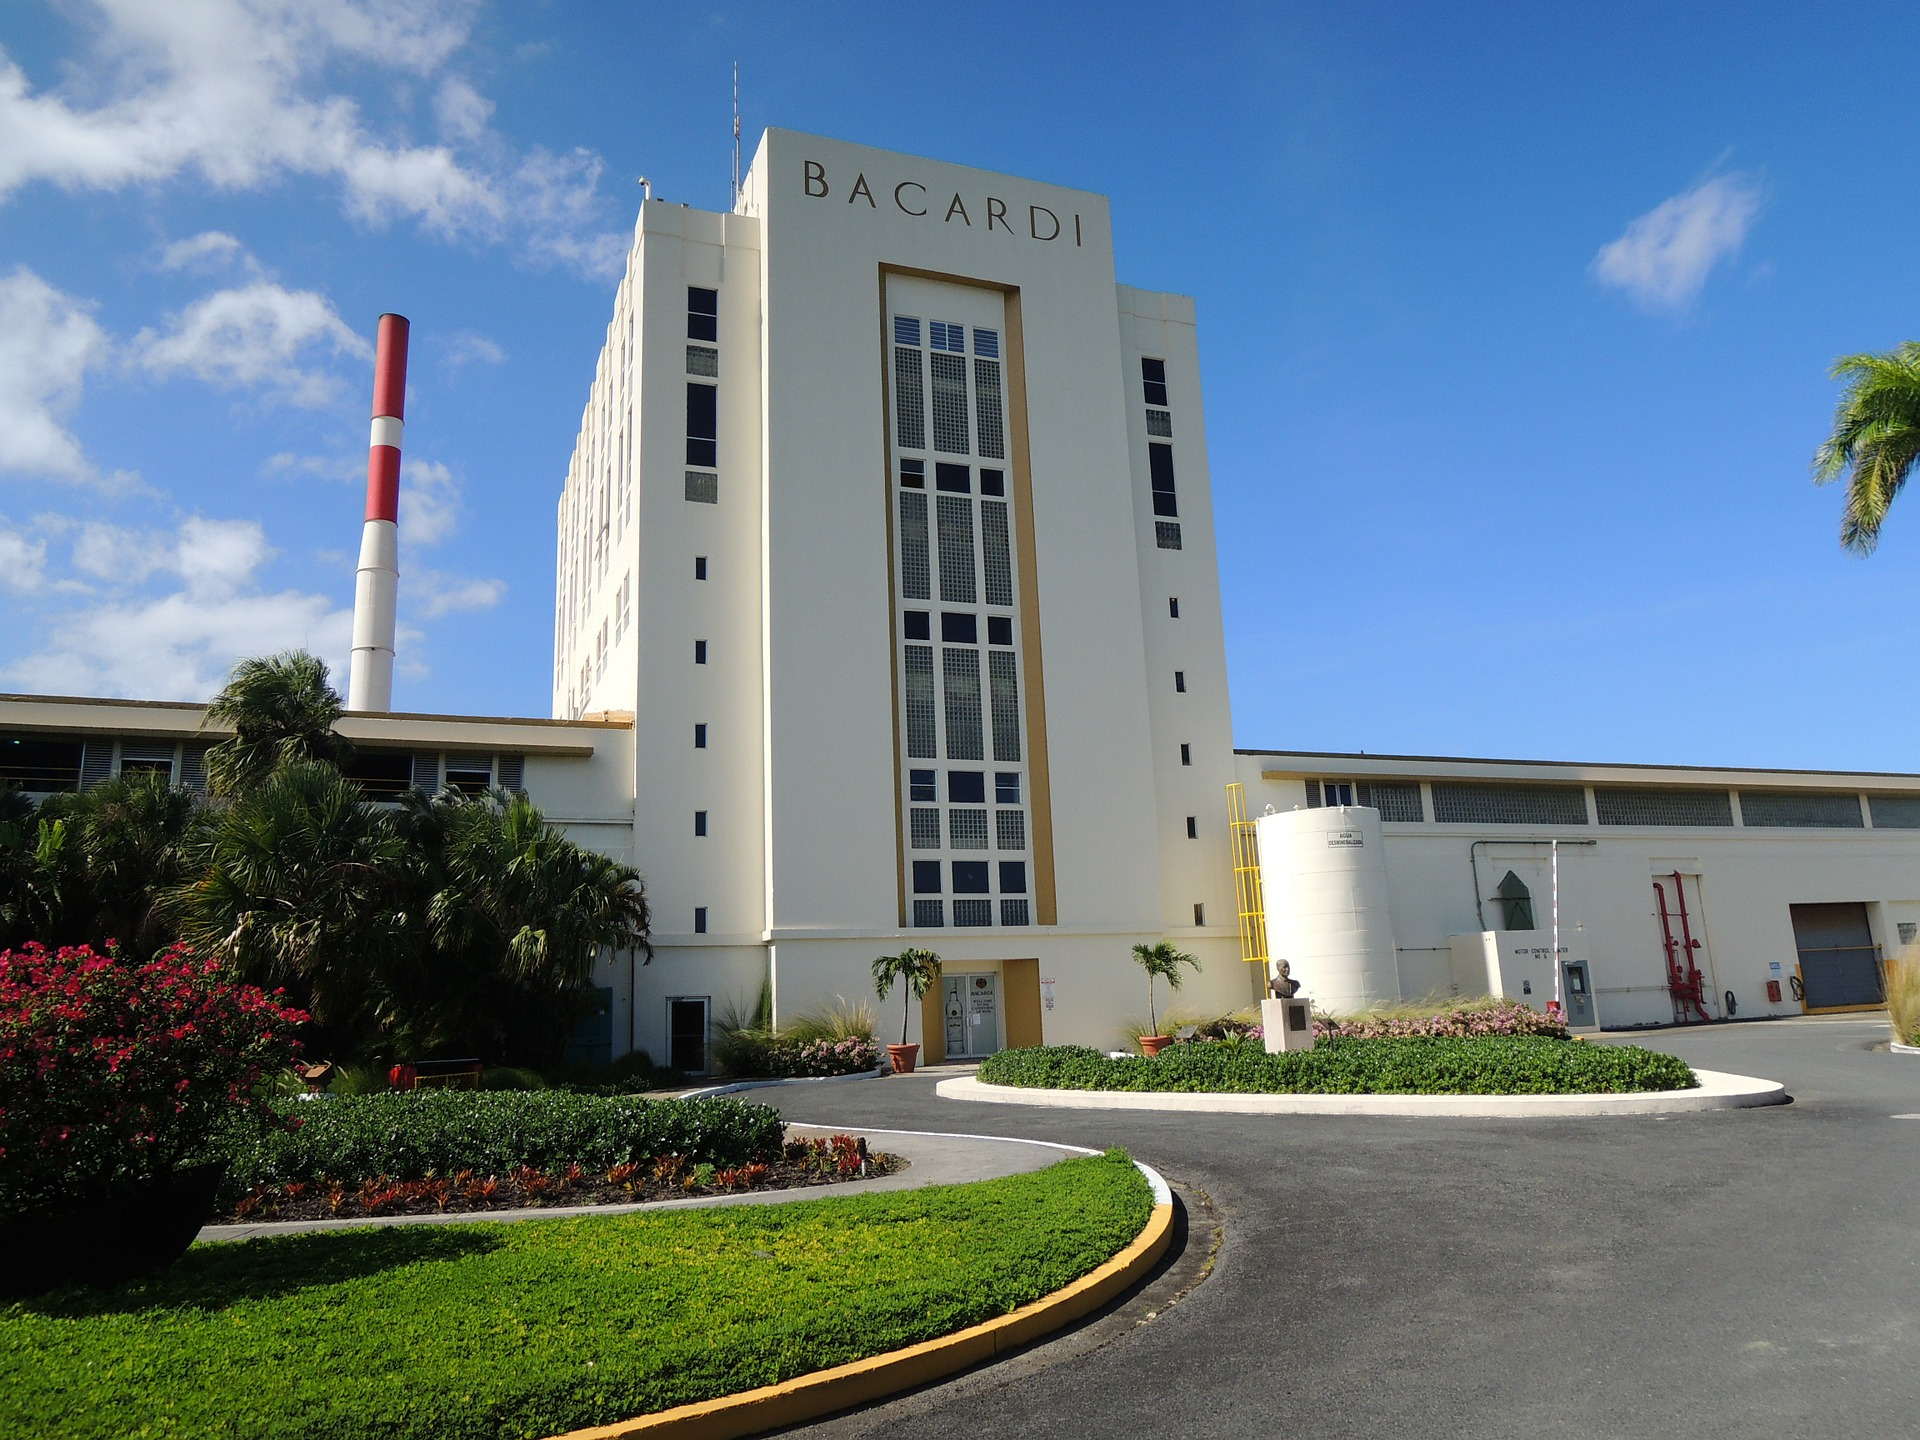 Casa Bacardí en Puerto Rico